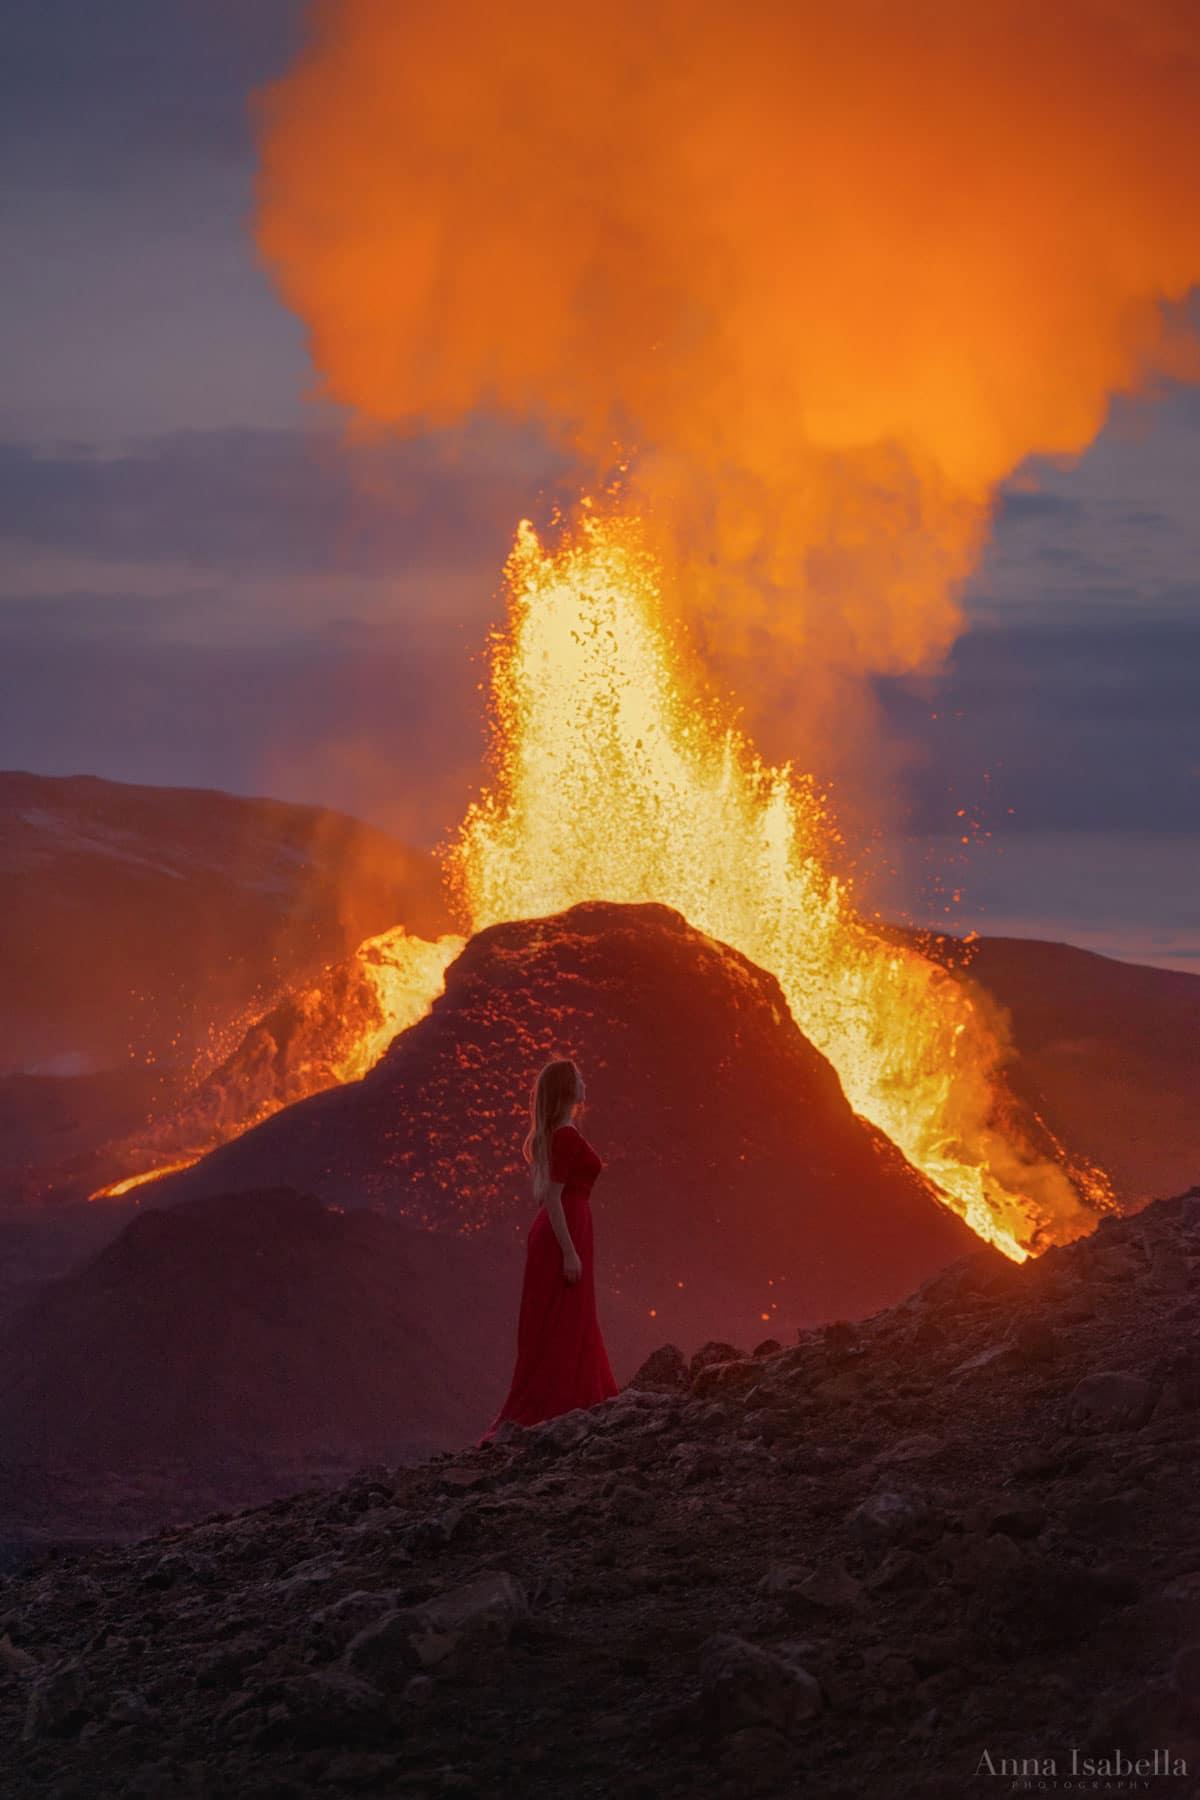 Self Portrait in Front of an Erupting Volcano